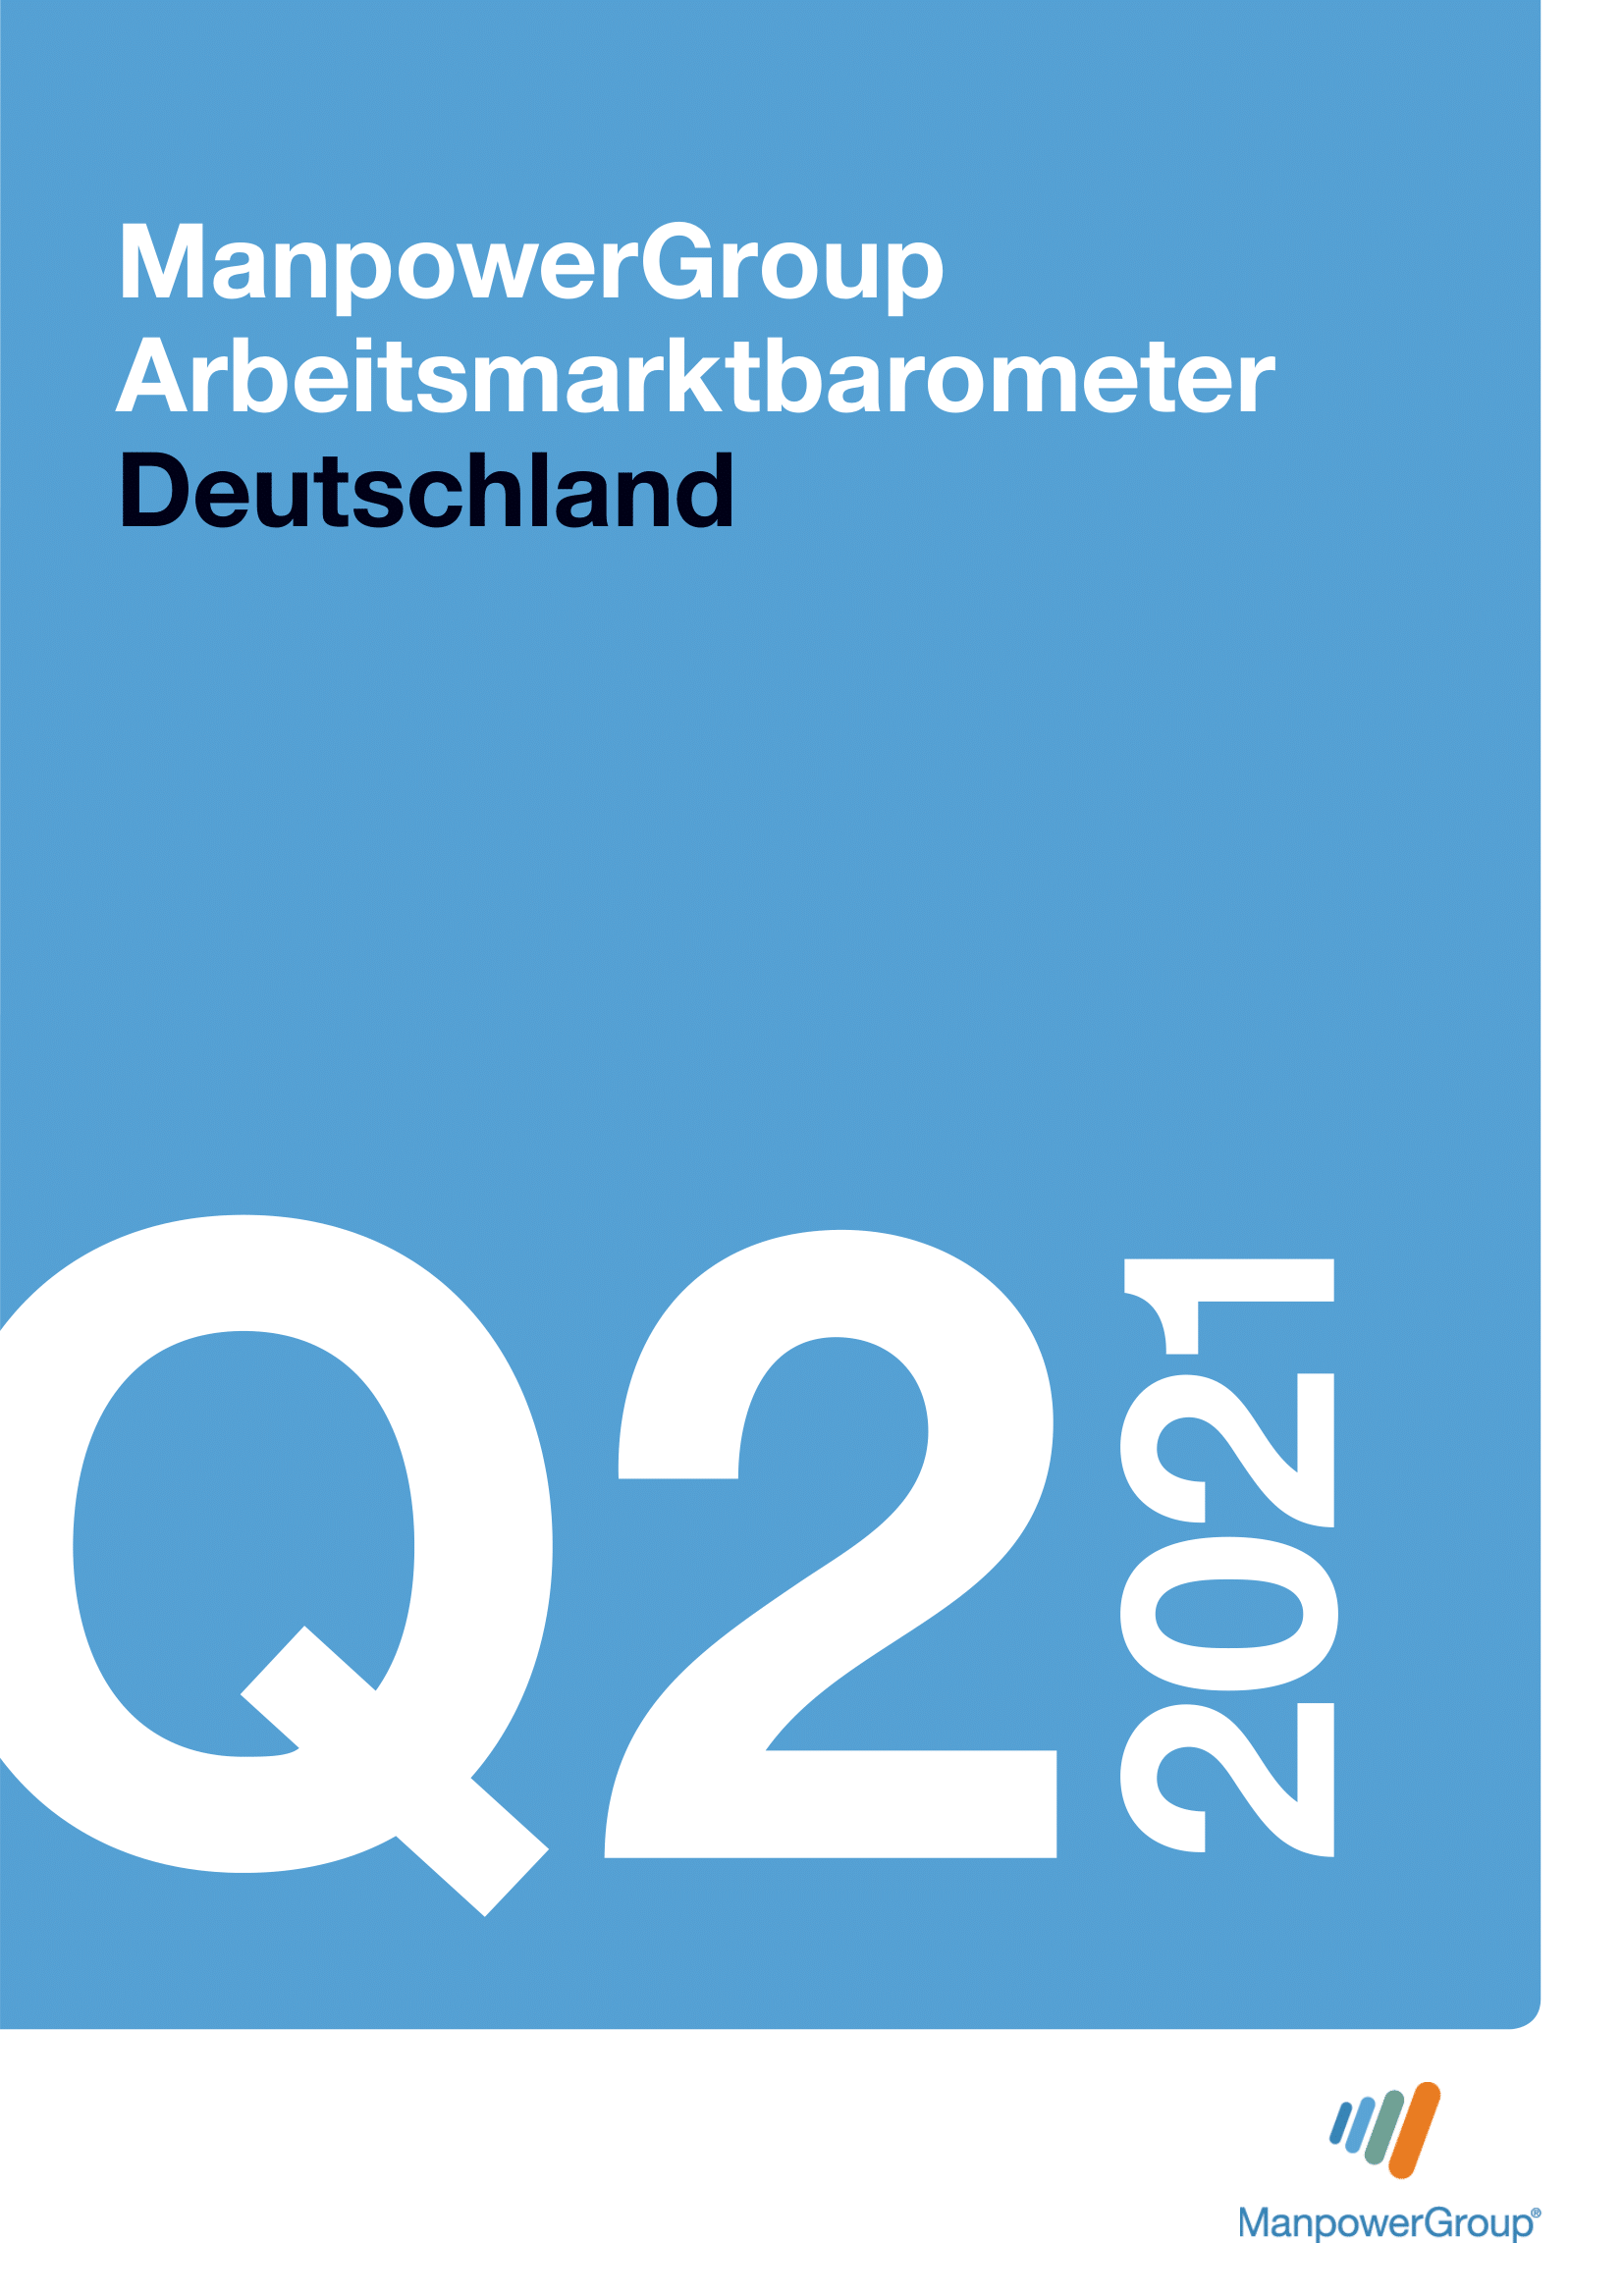 DE_DE_MEOSbrochure_2Q21_Deckblatt-1